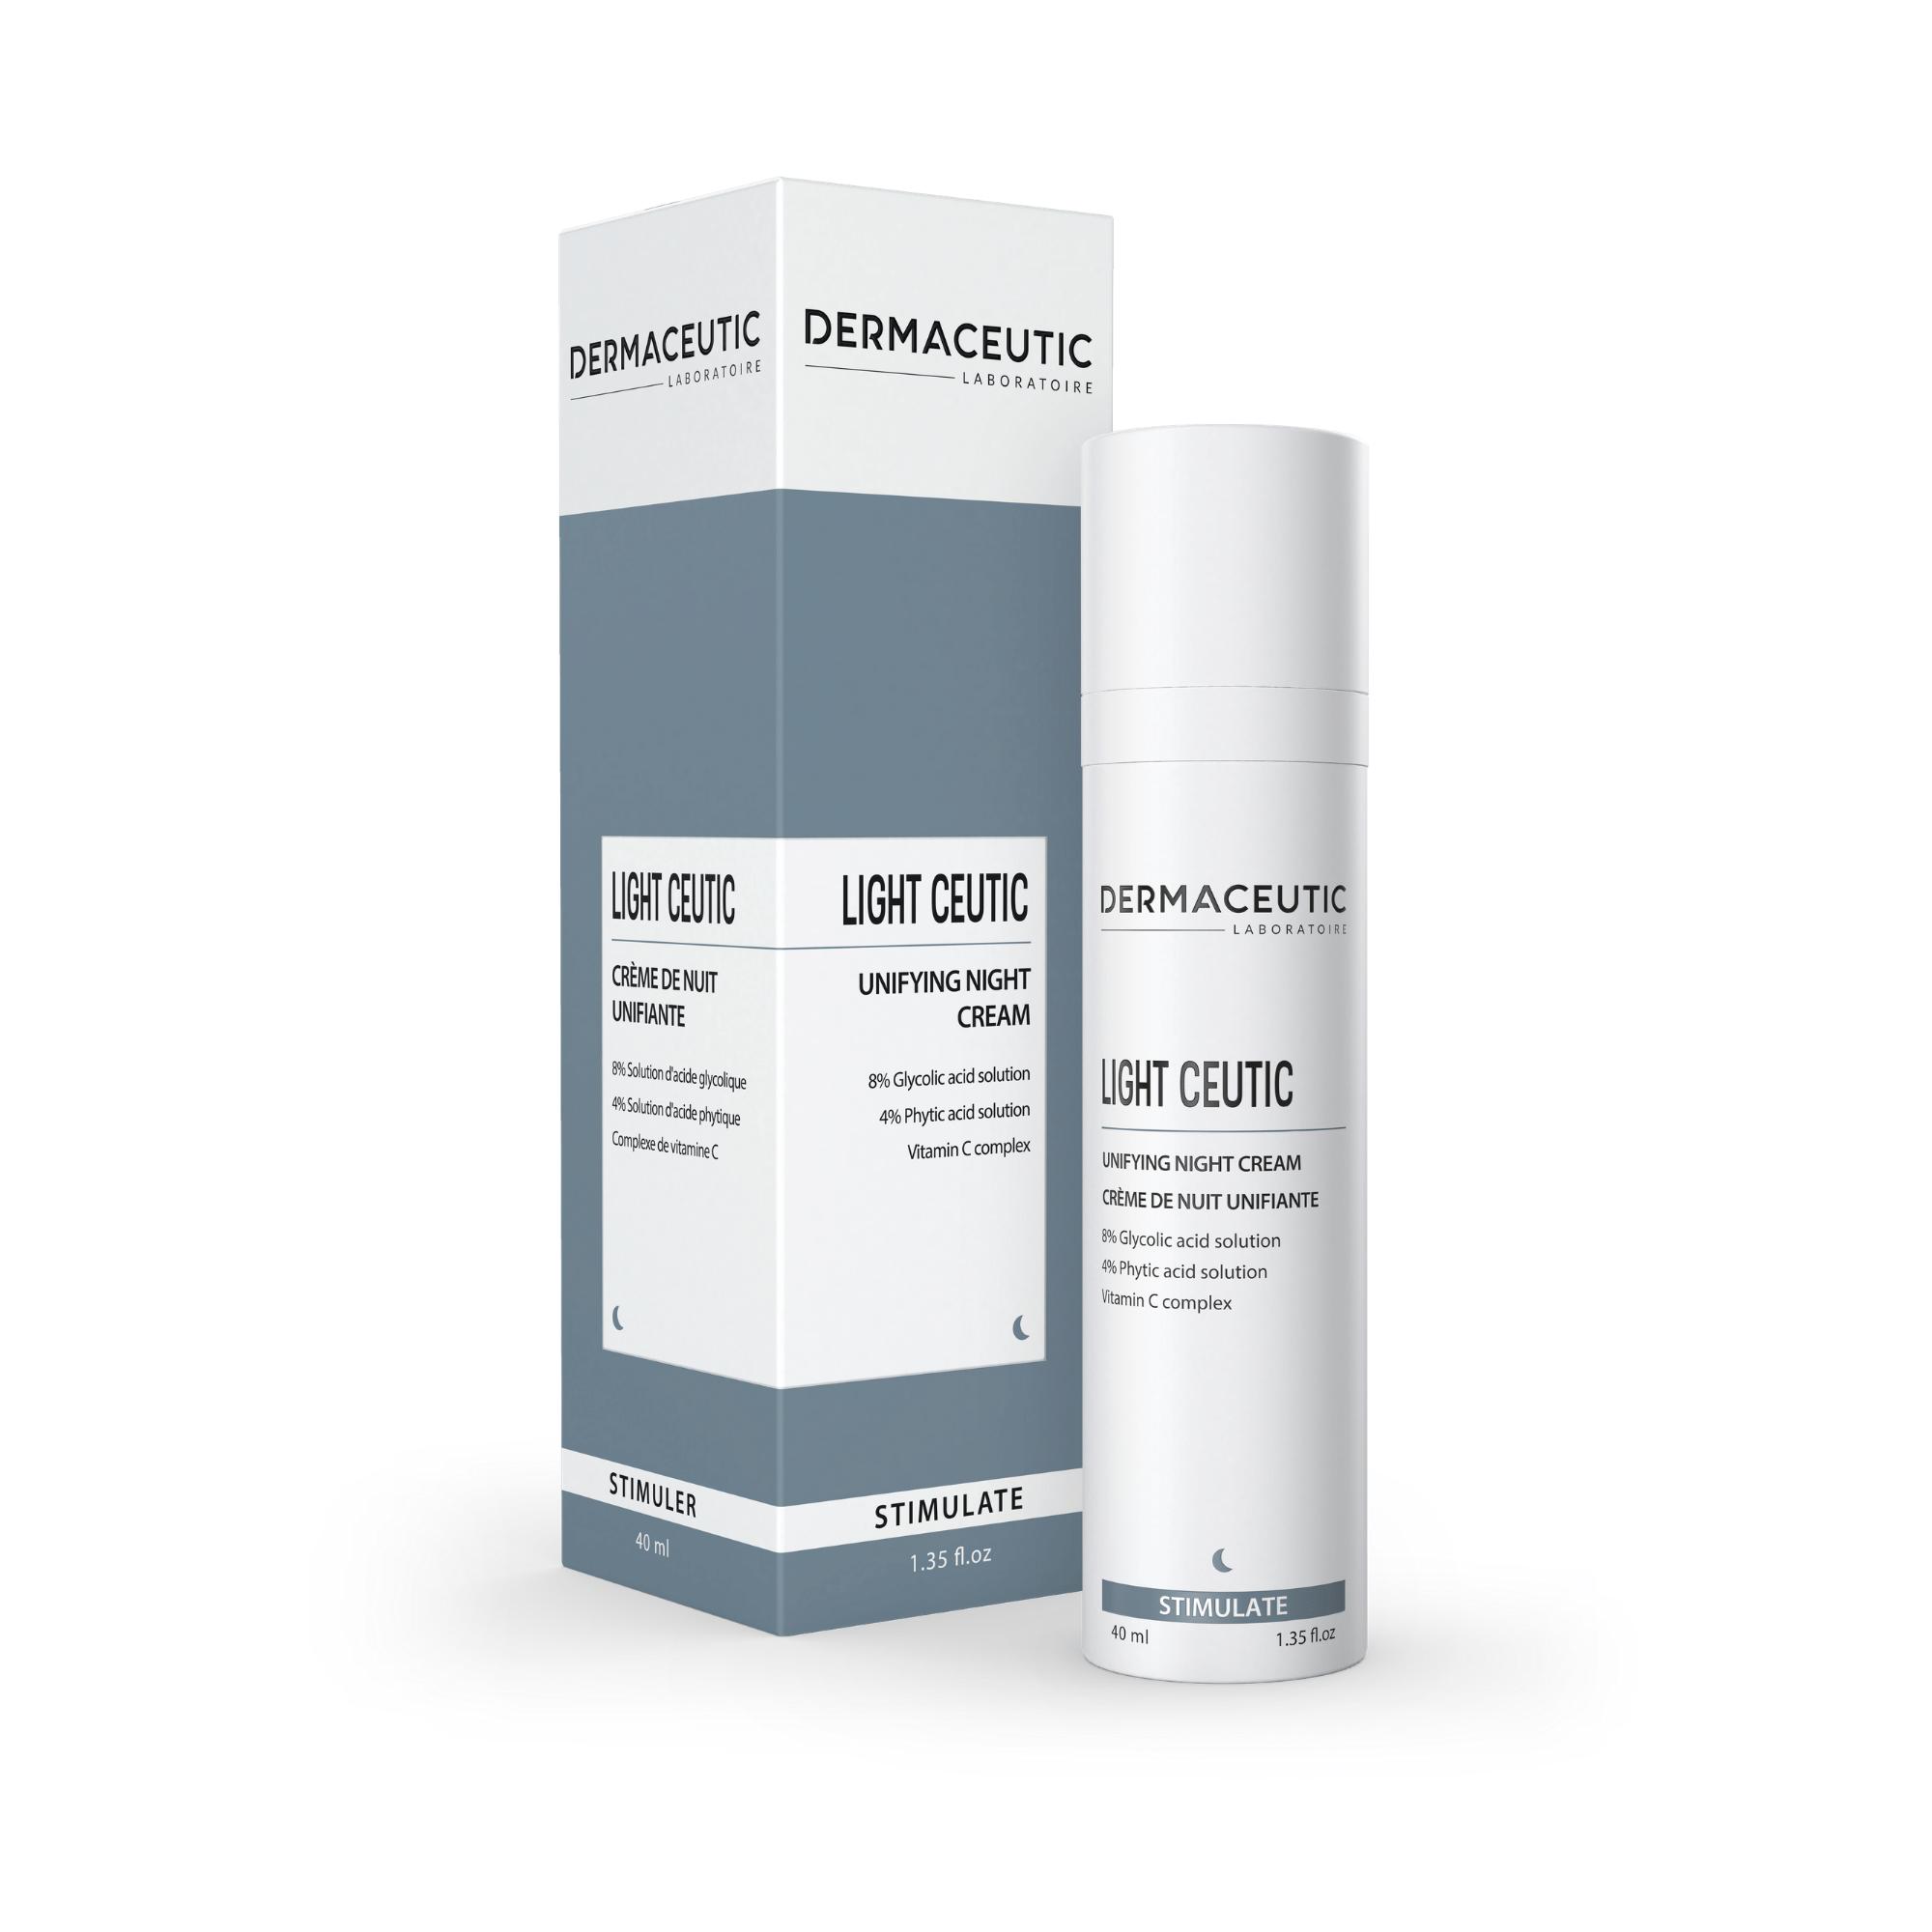 Dermaceutic Light Ceutic - Huidpraktijkshop